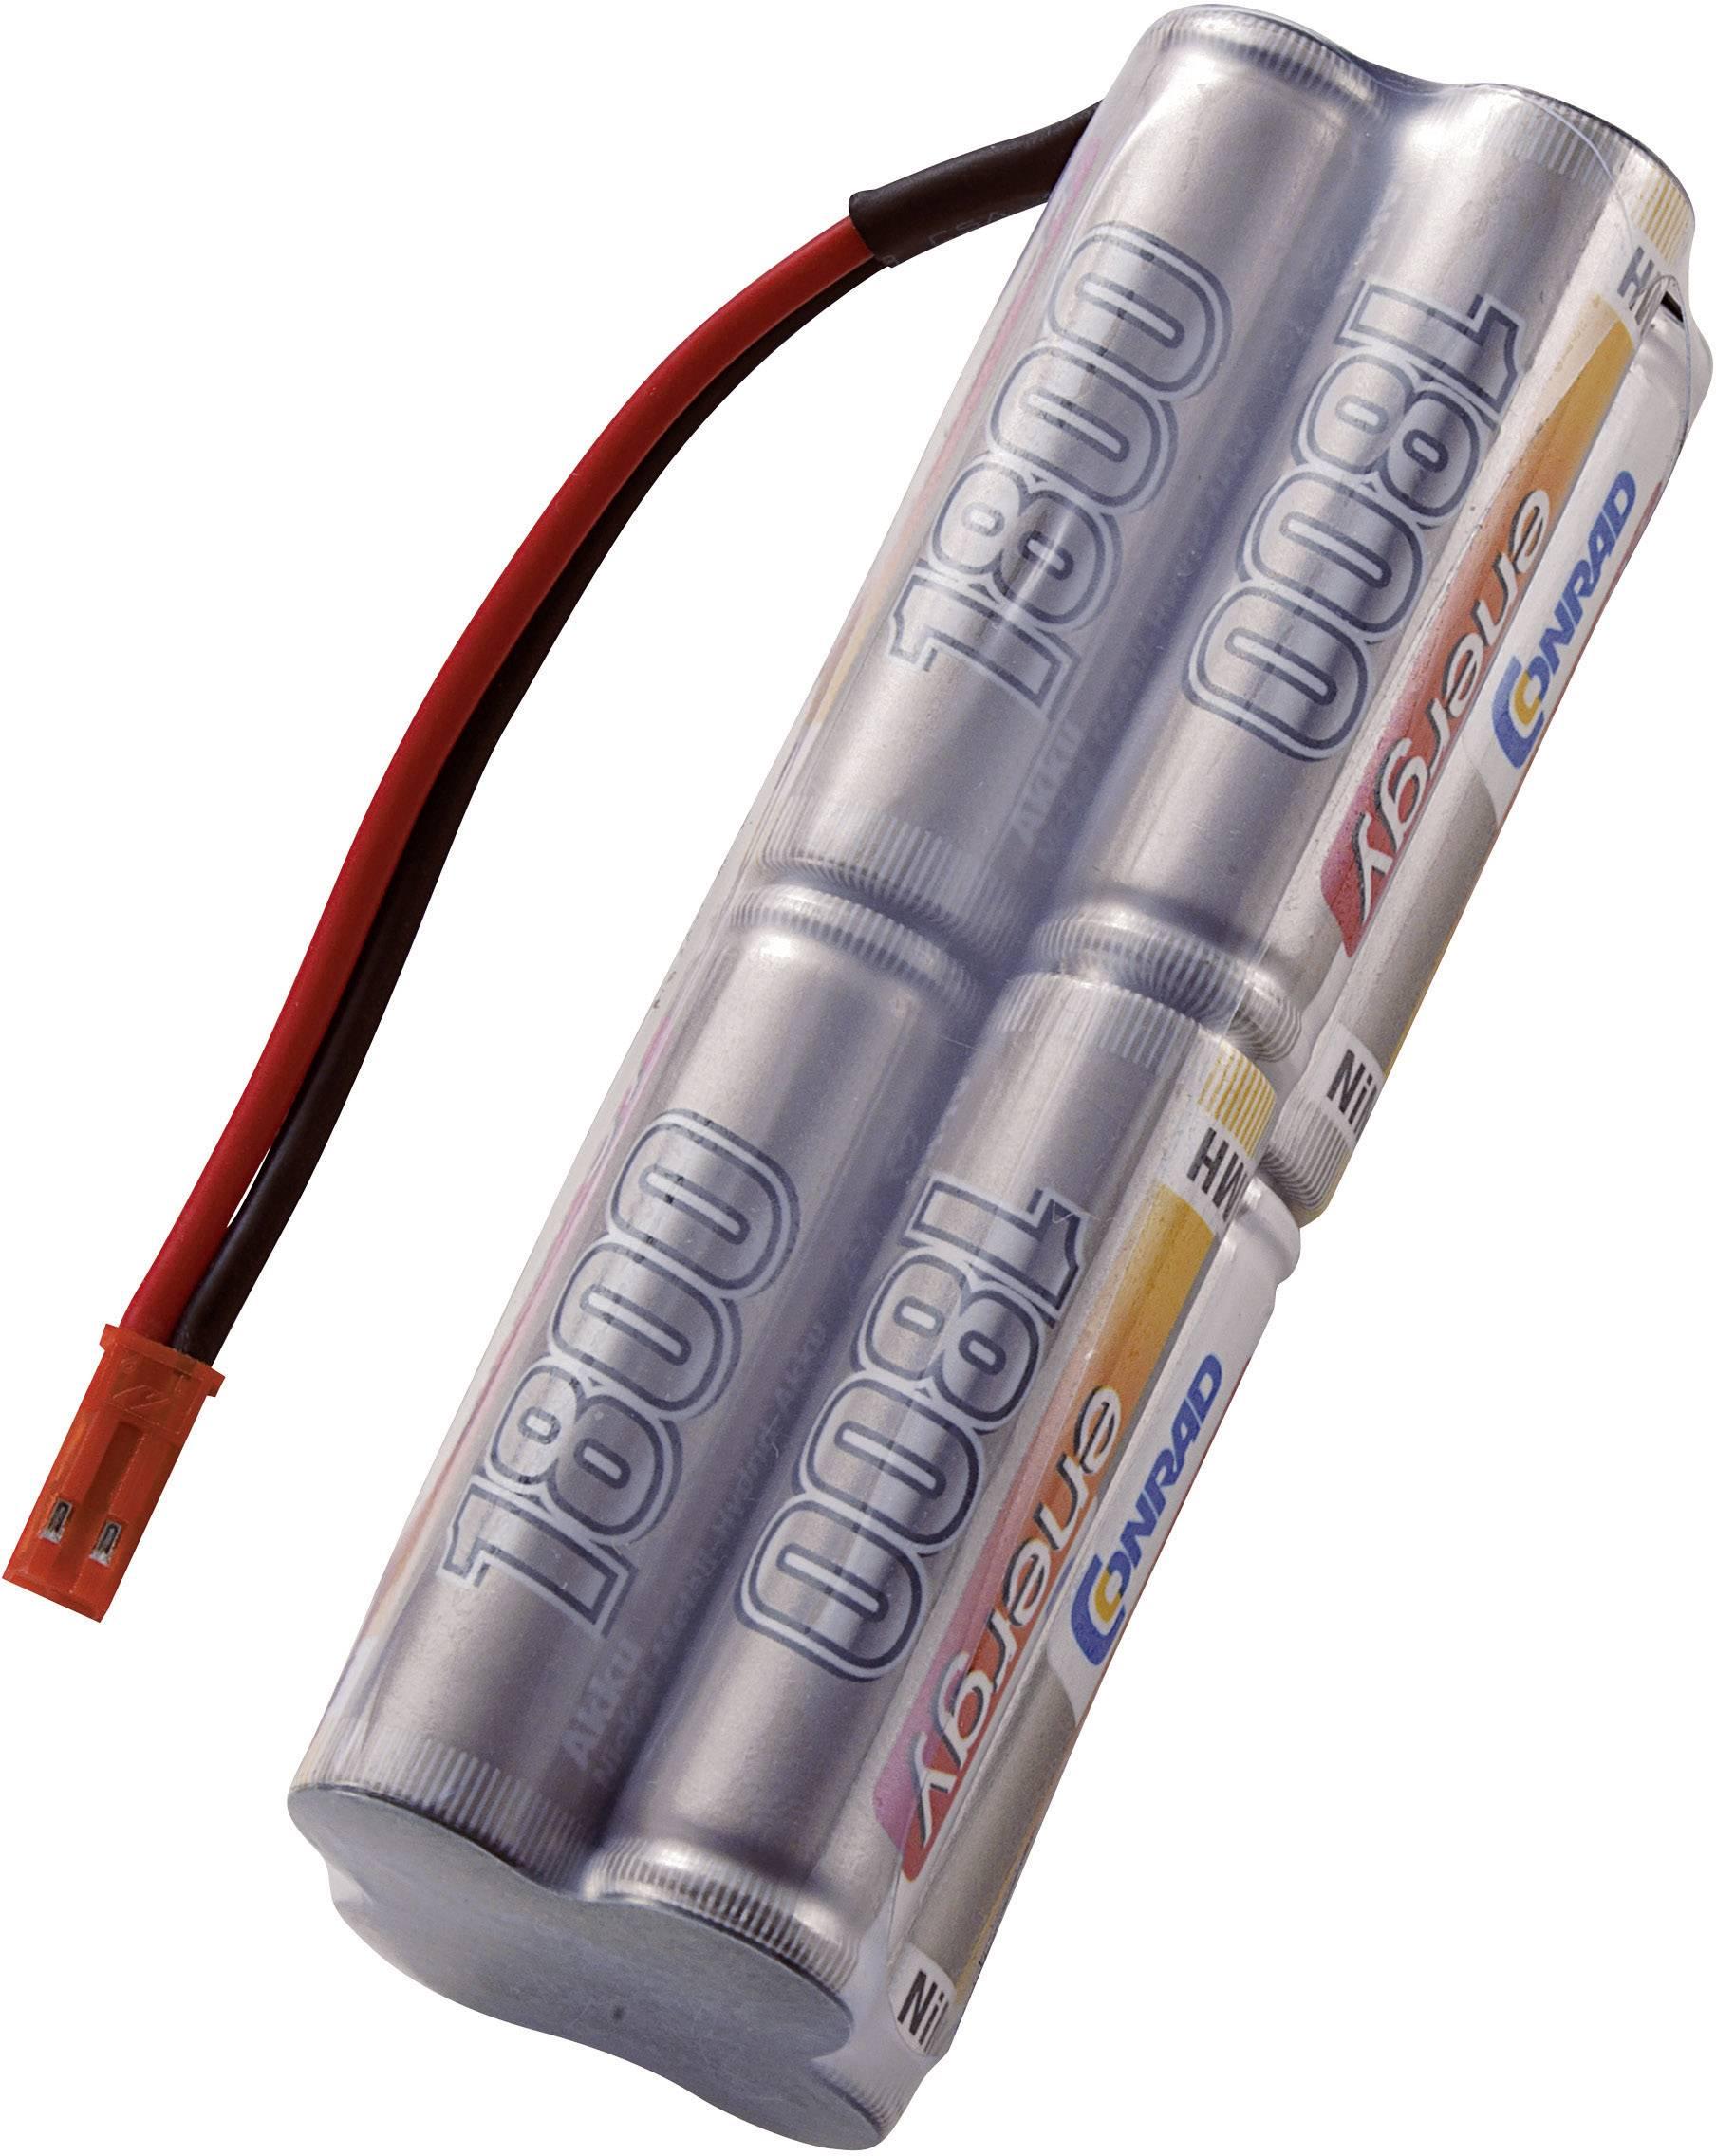 Akupack NiMH Conrad Energy AA, 9,6 V, 1800 mAh, Block, BEC